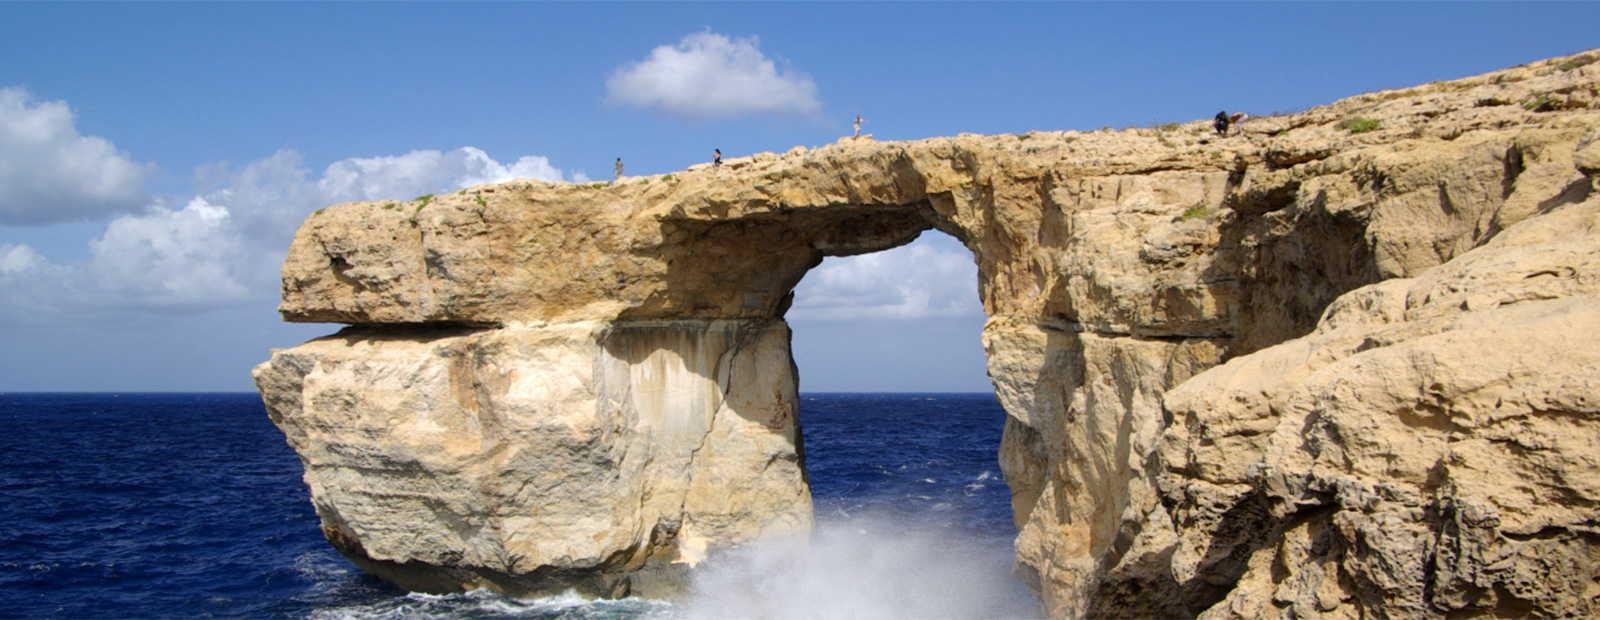 Exklusive Ferienhäuser auf Malta